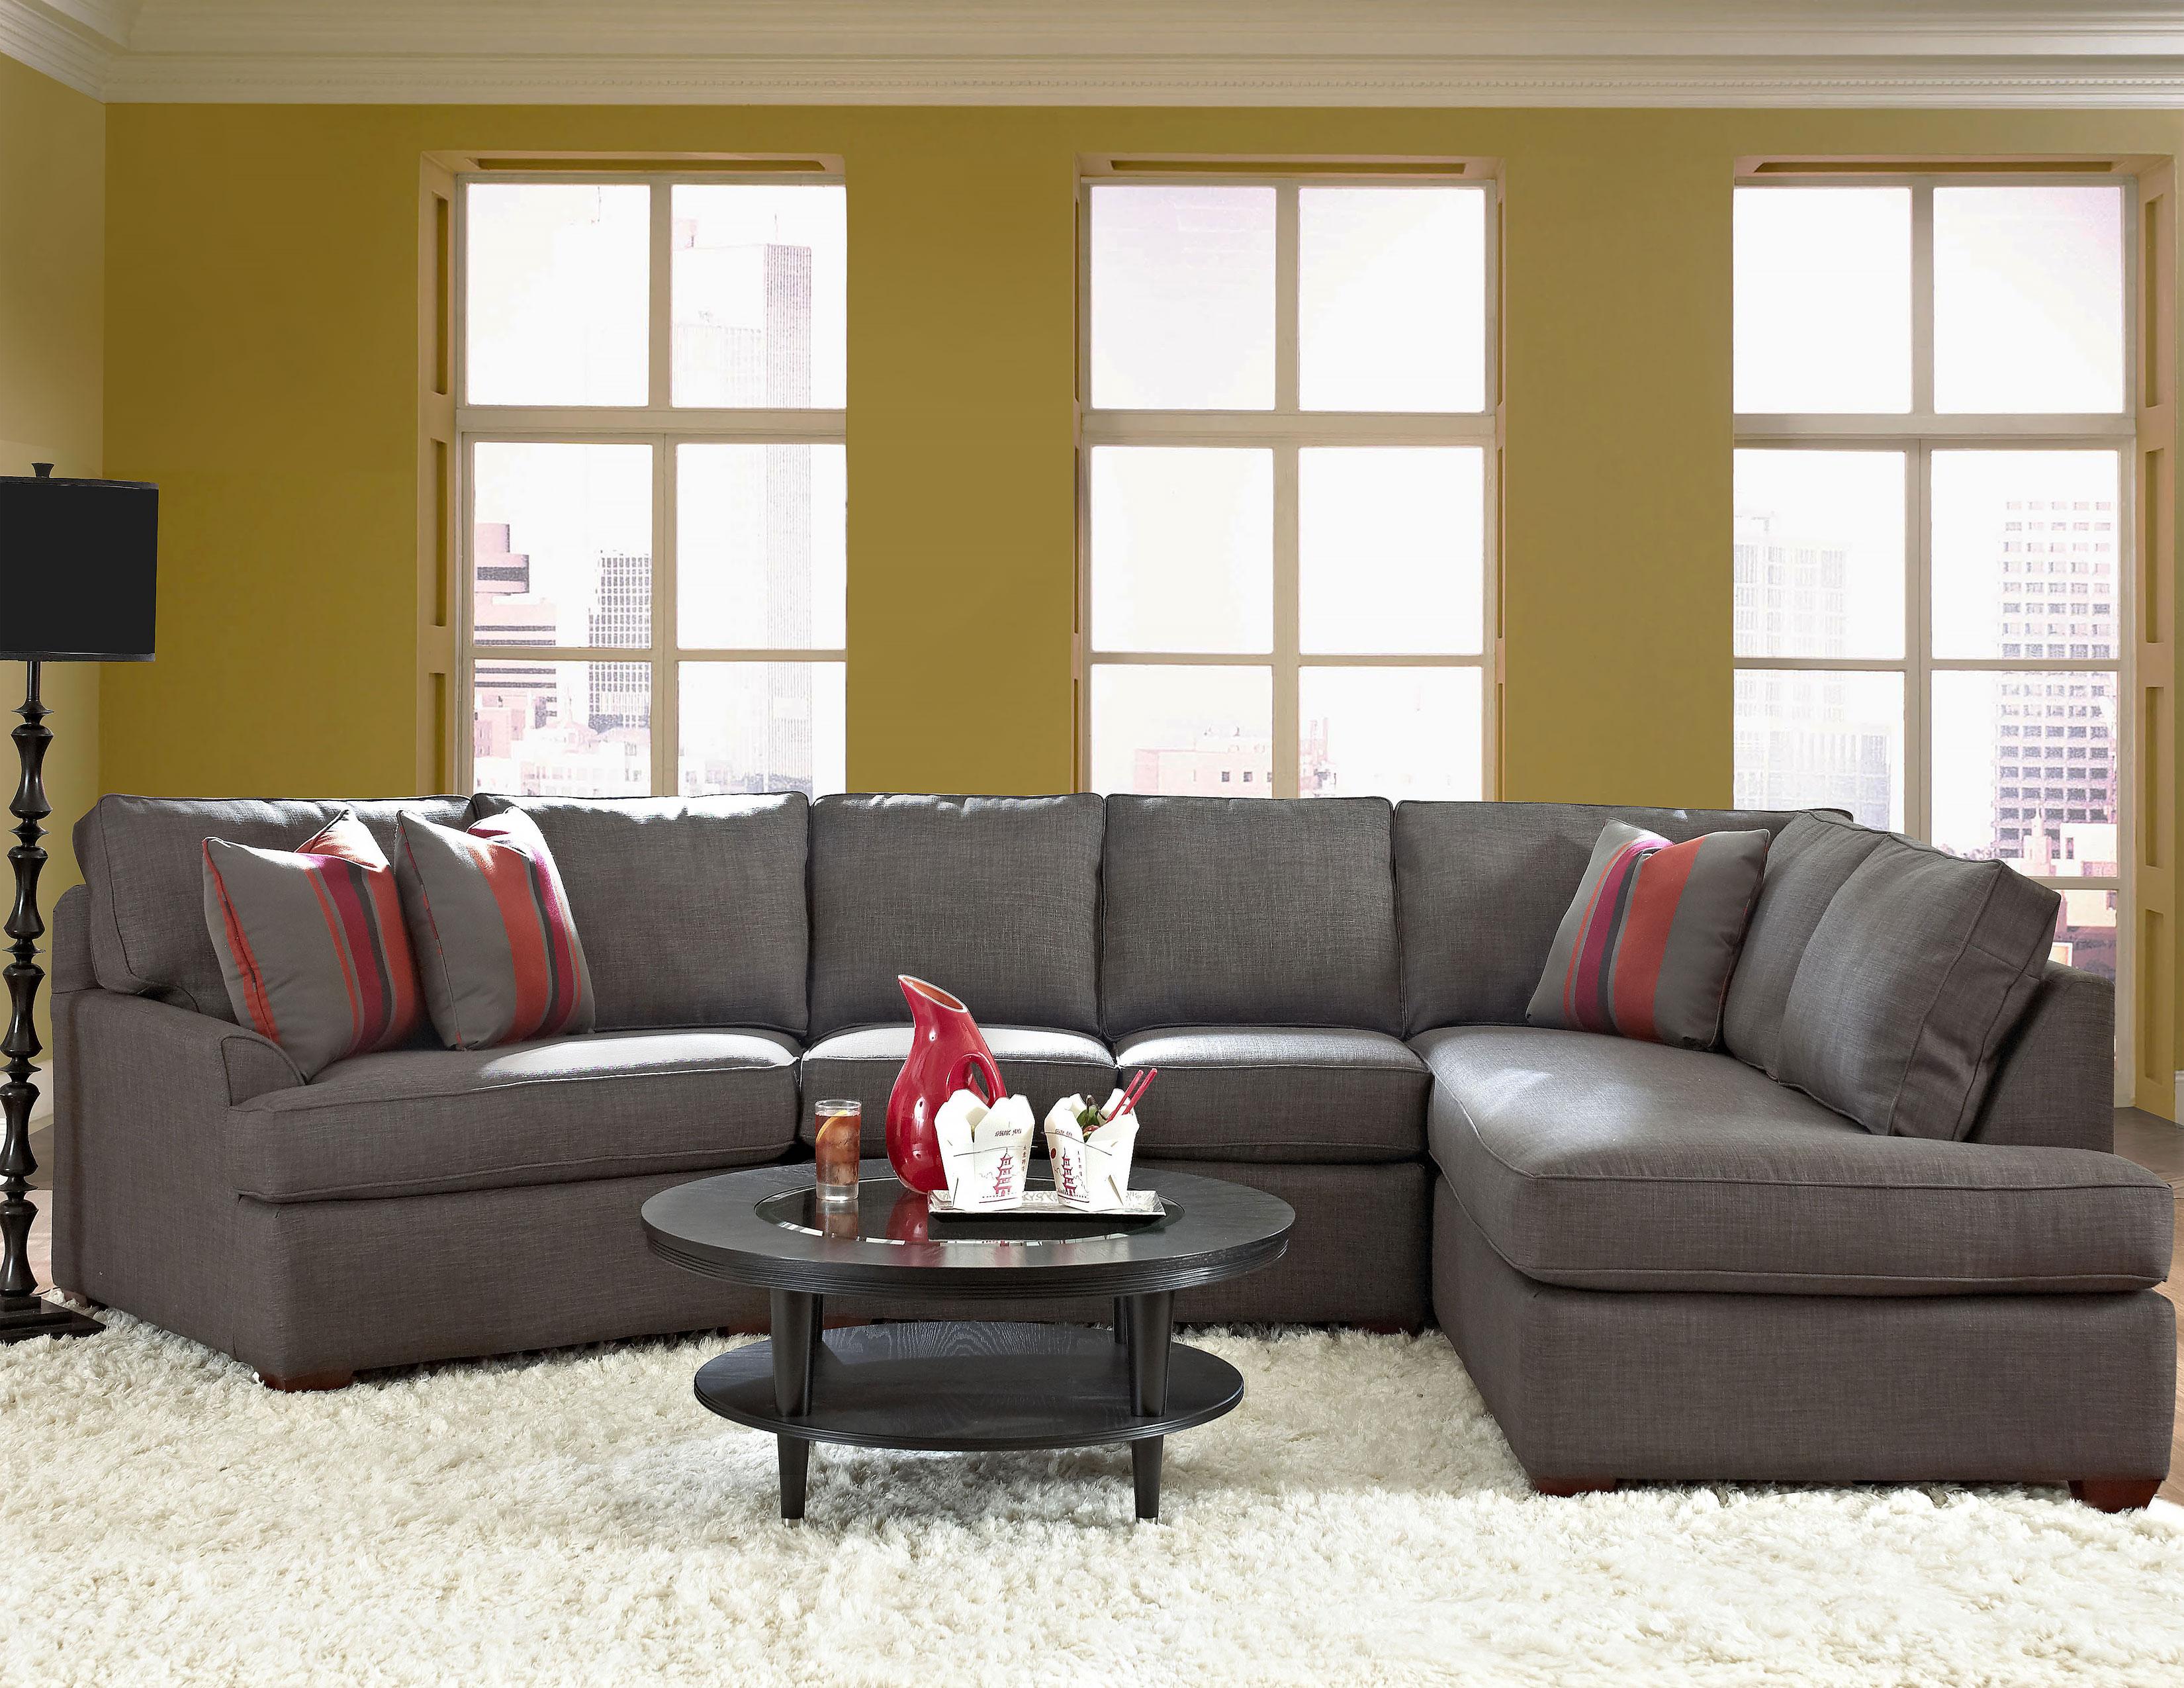 Grady K55260 Sectional Hundreds Of Fabrics Sofas And